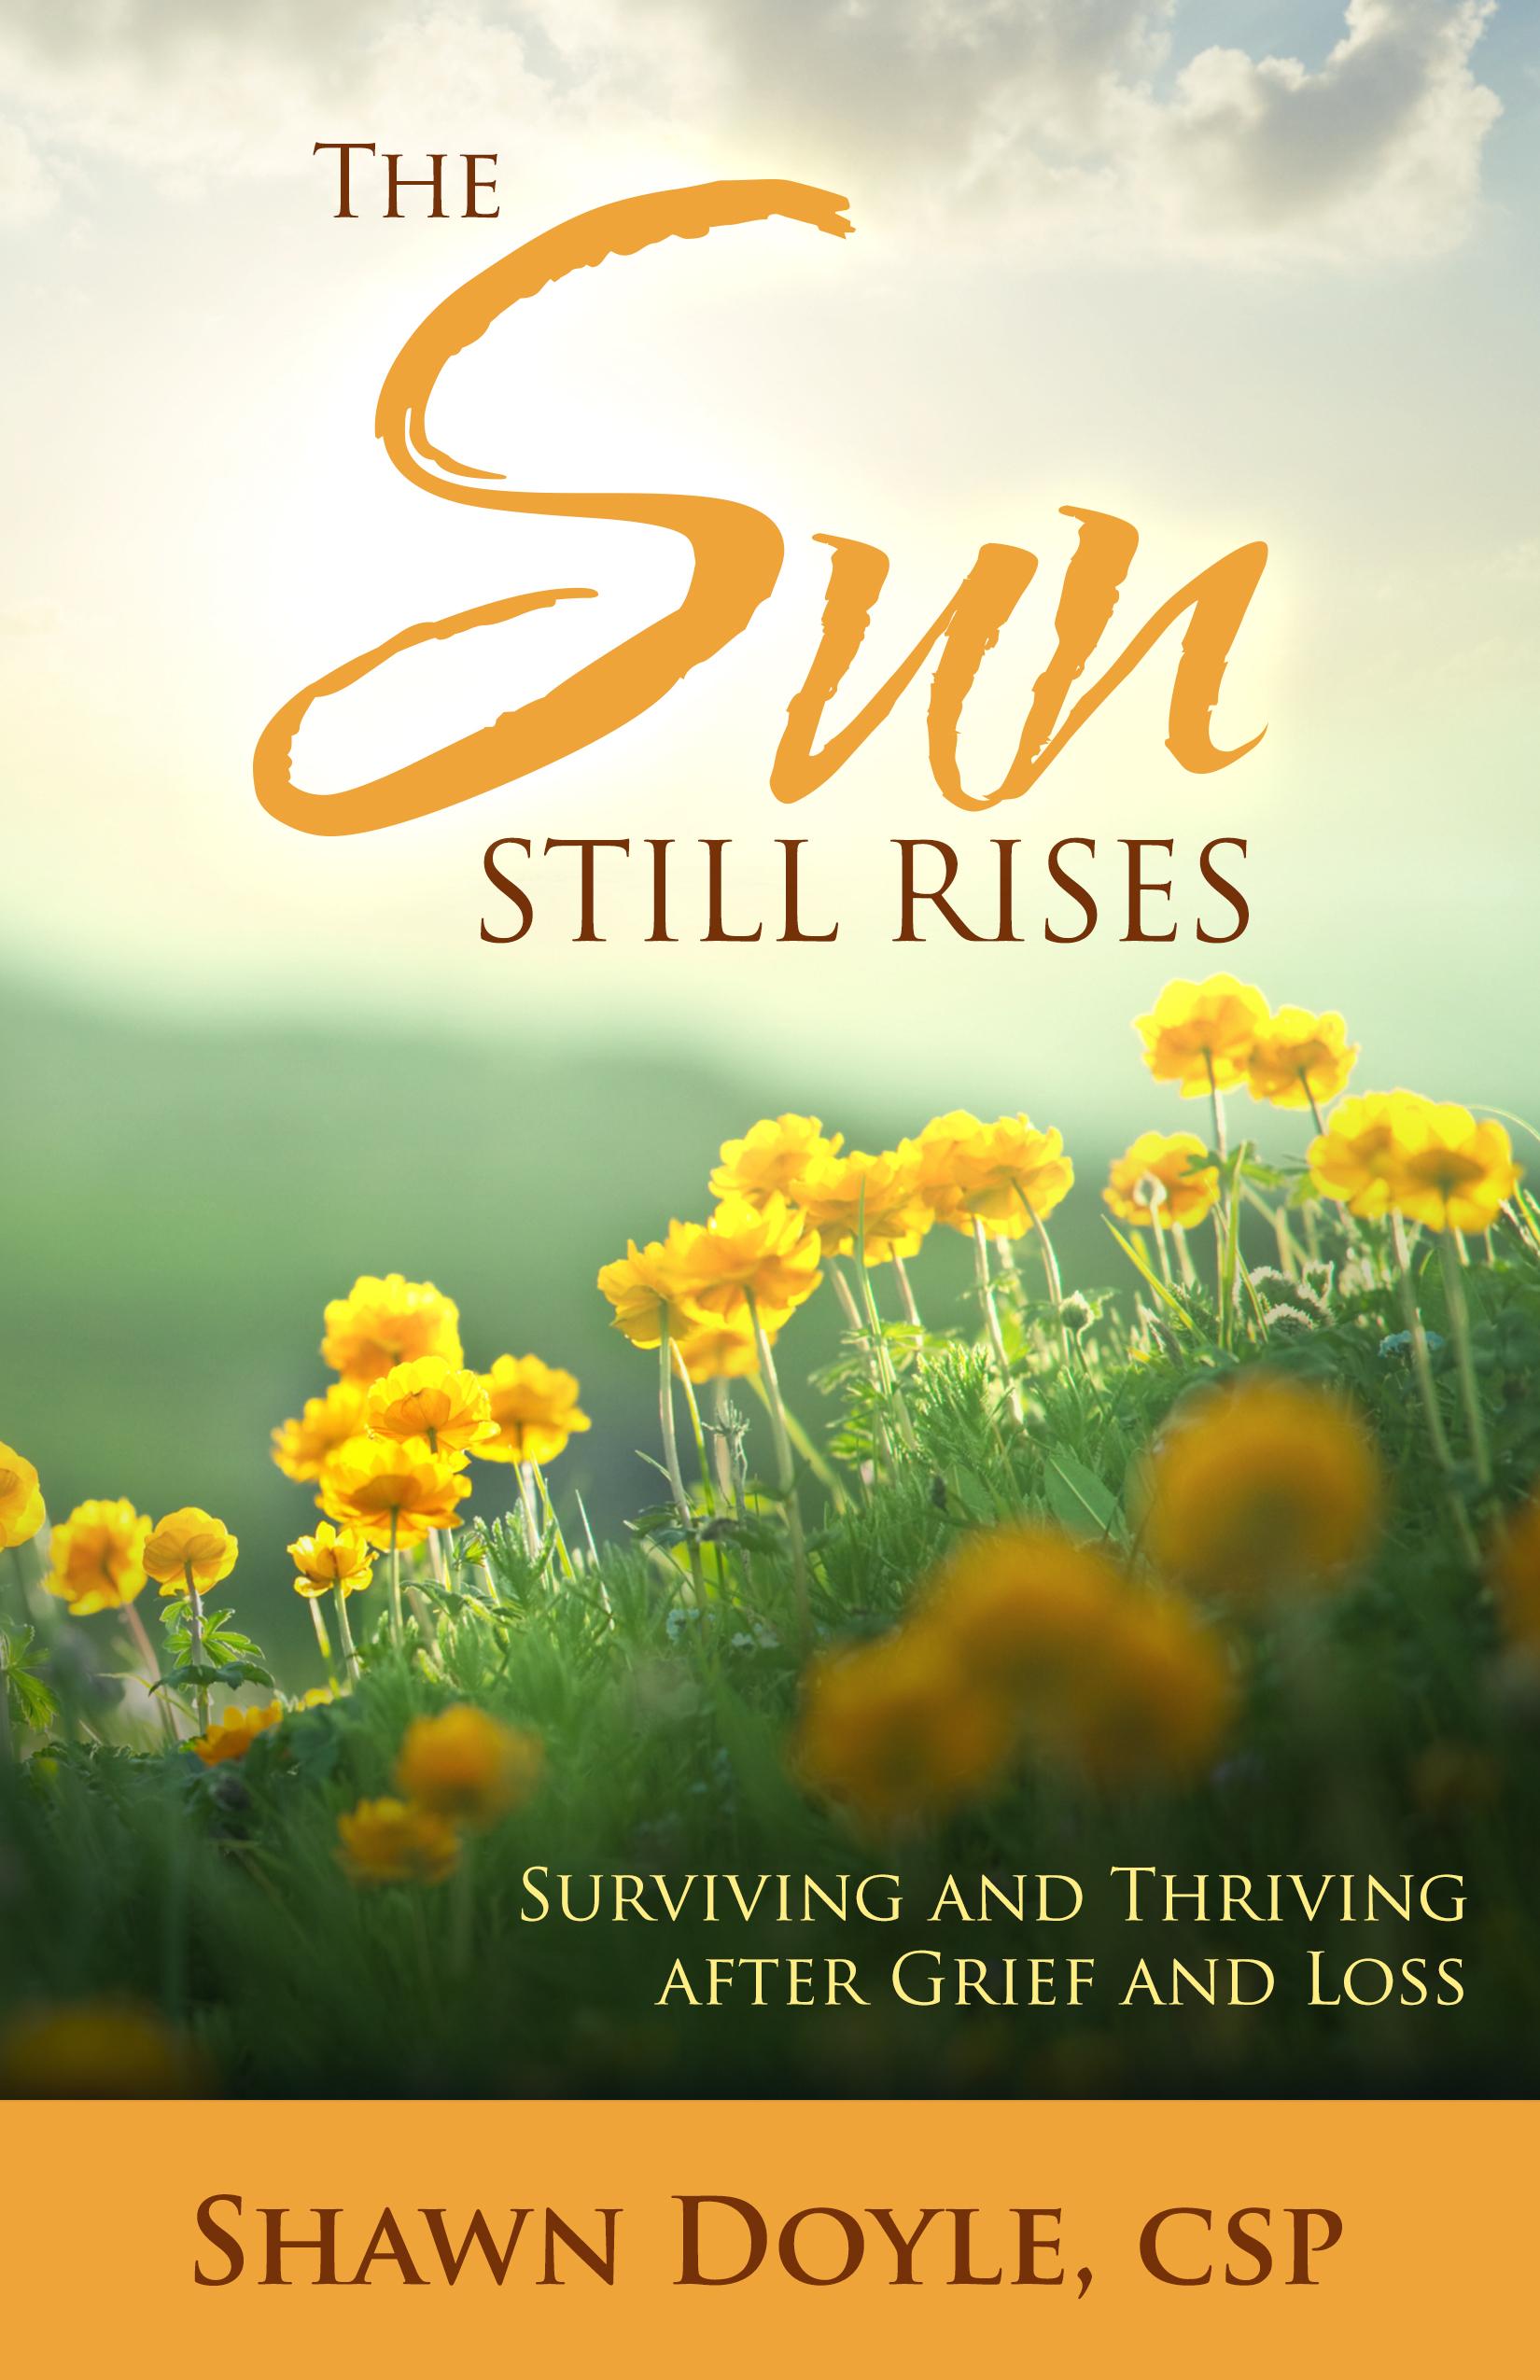 The Sun Still Rises - By shawn doyle csp